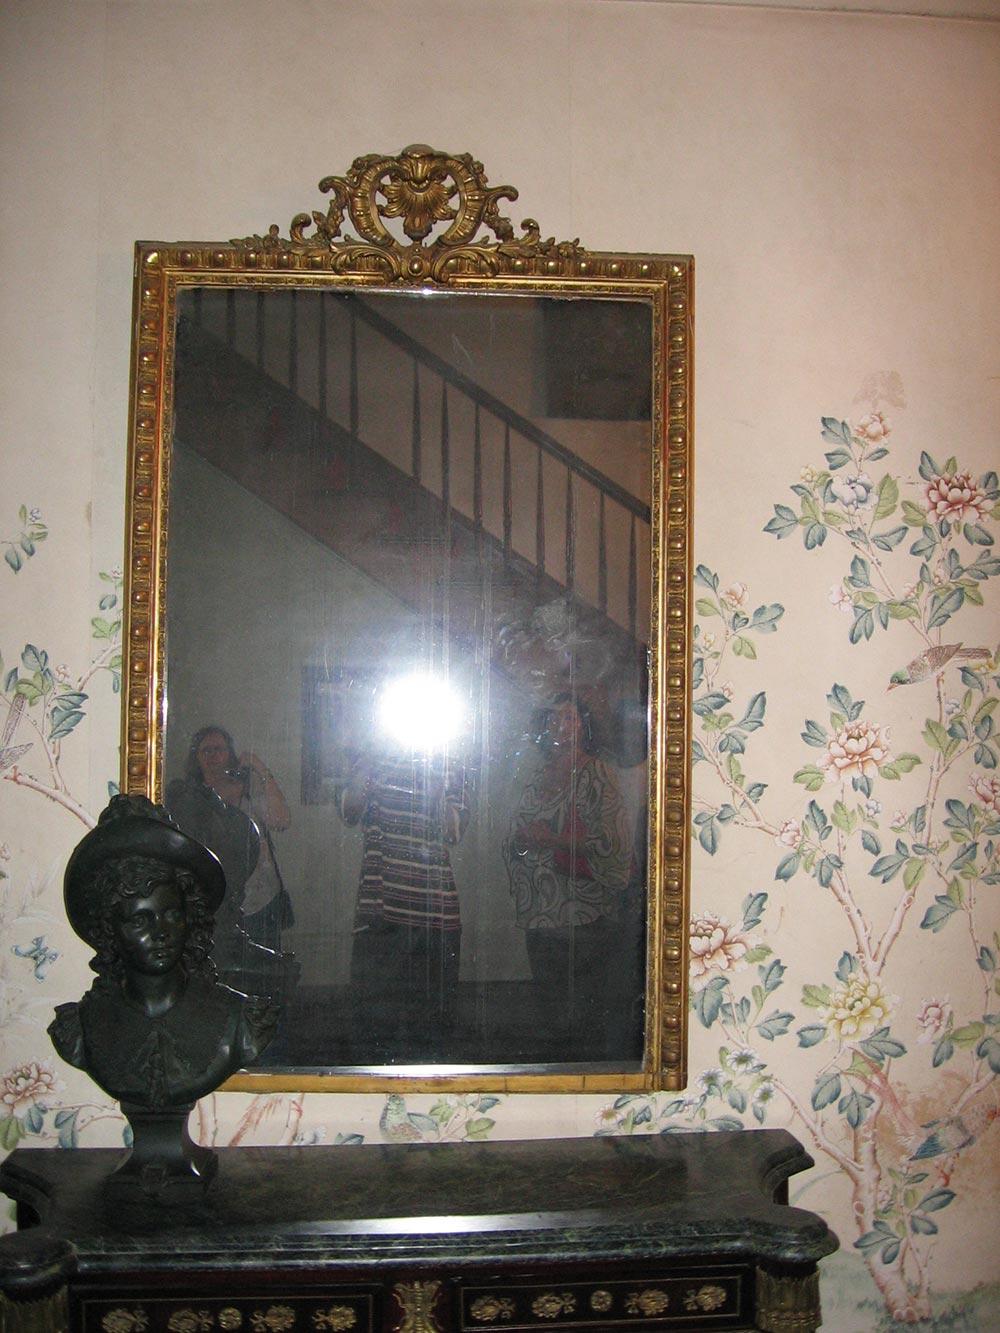 Проклятое зеркало плантации Миртл